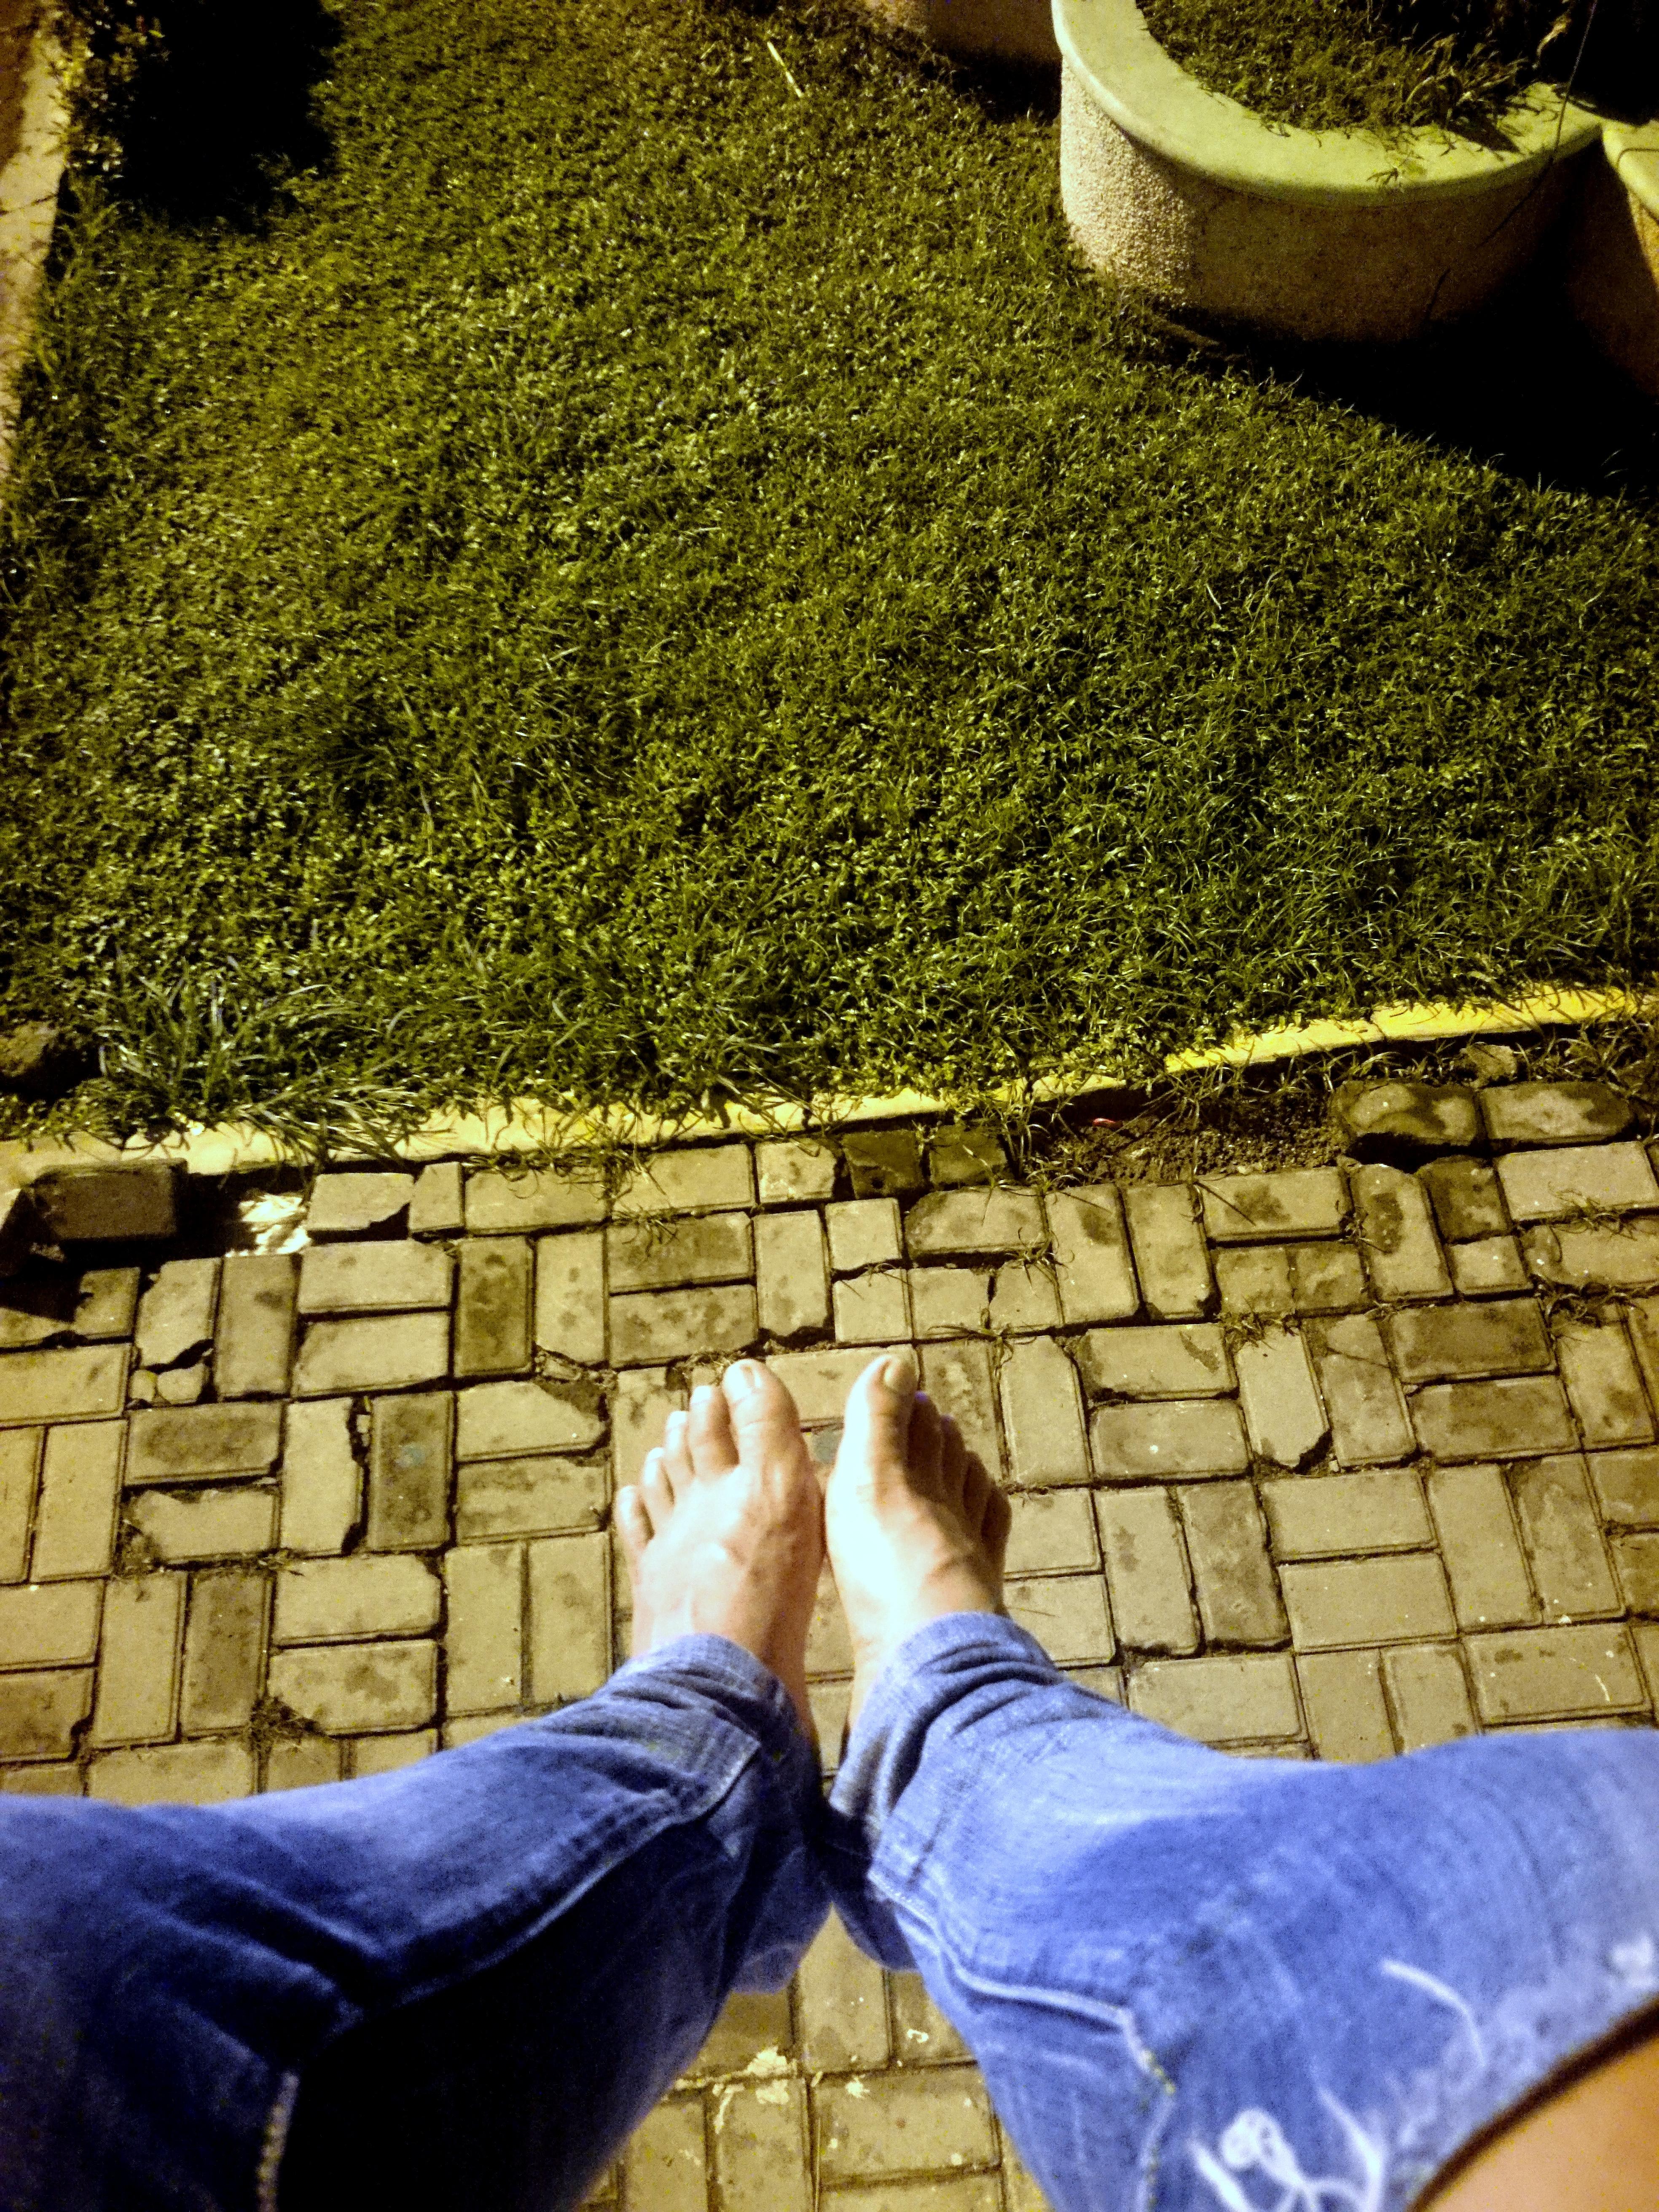 My Feet, Bare, Feet, Human, Jeans, HQ Photo